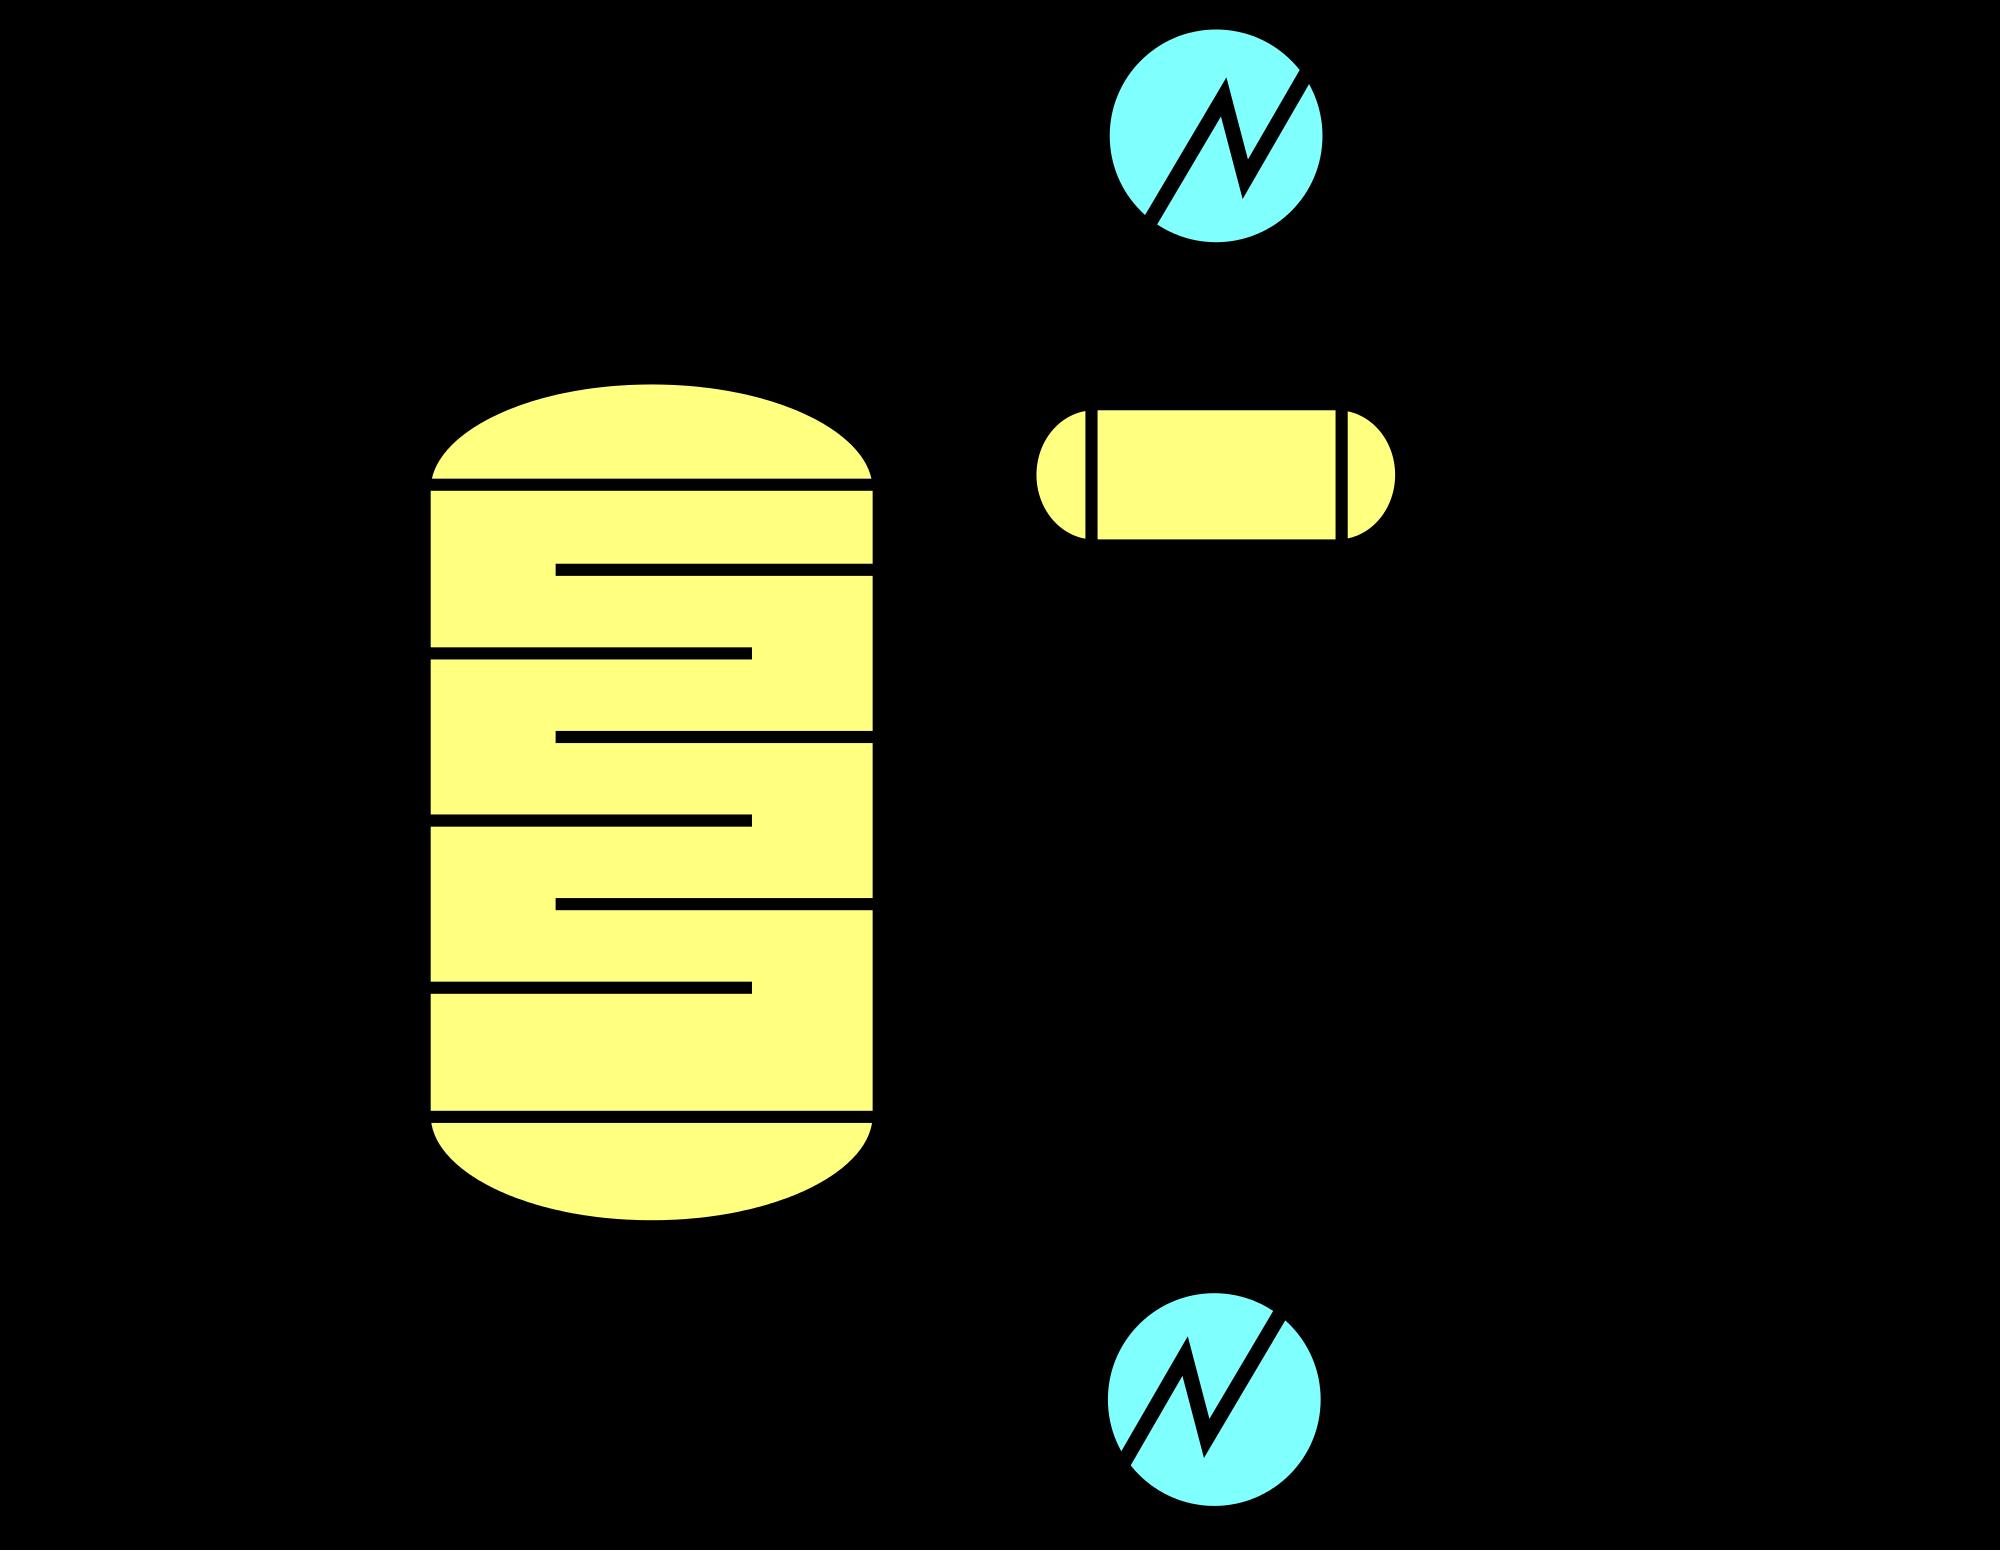 Evaporation clipart thermodynamics. File chembioeng svg wikimedia